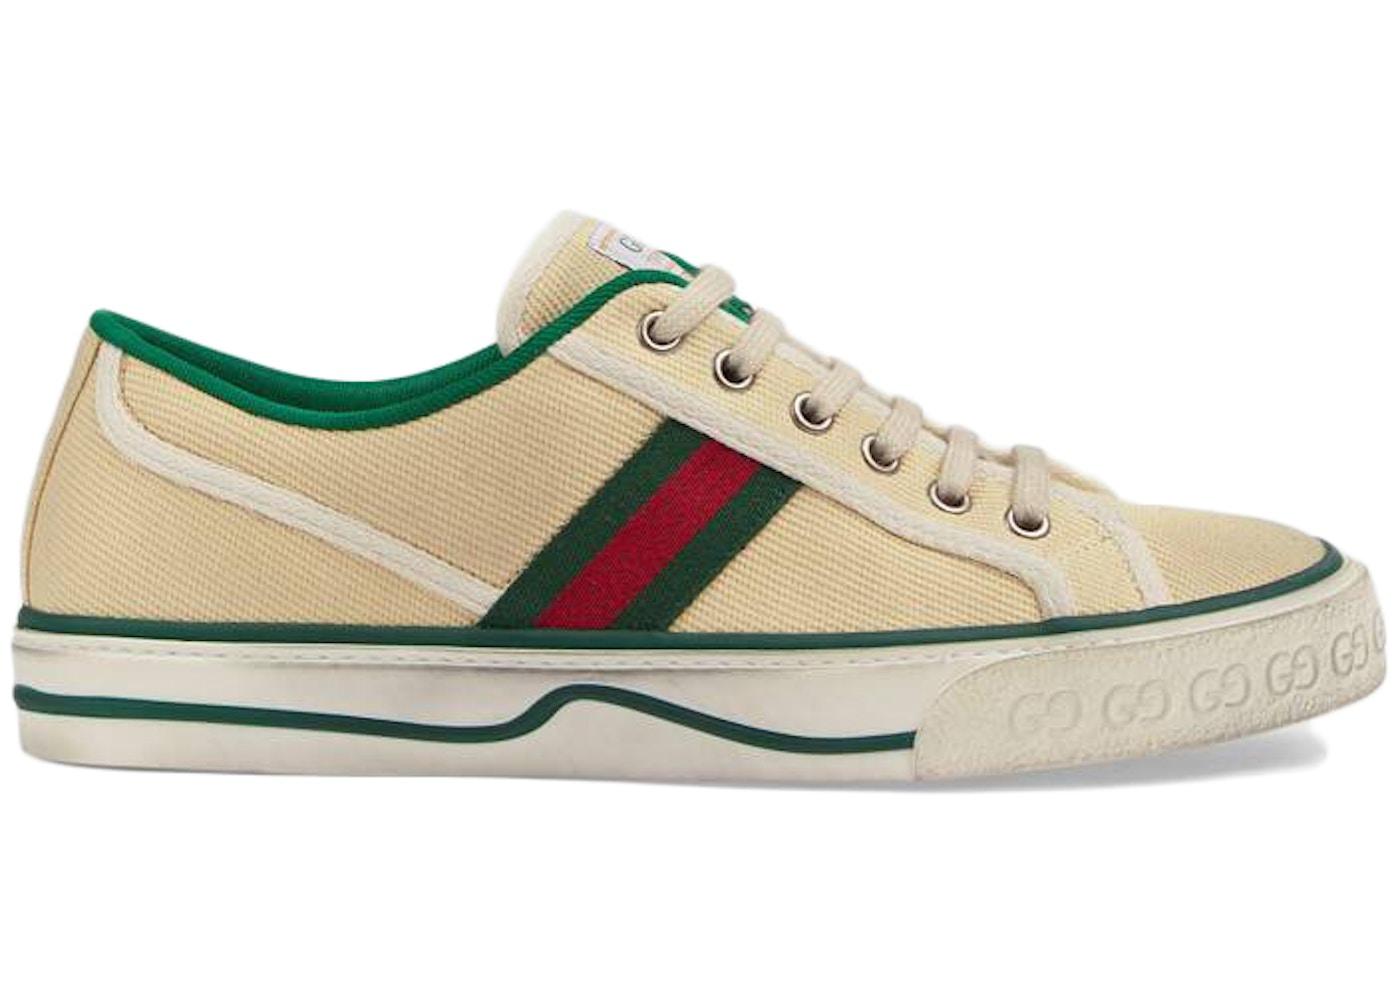 Gucci 1977 Tennis Butter Cotton (W)